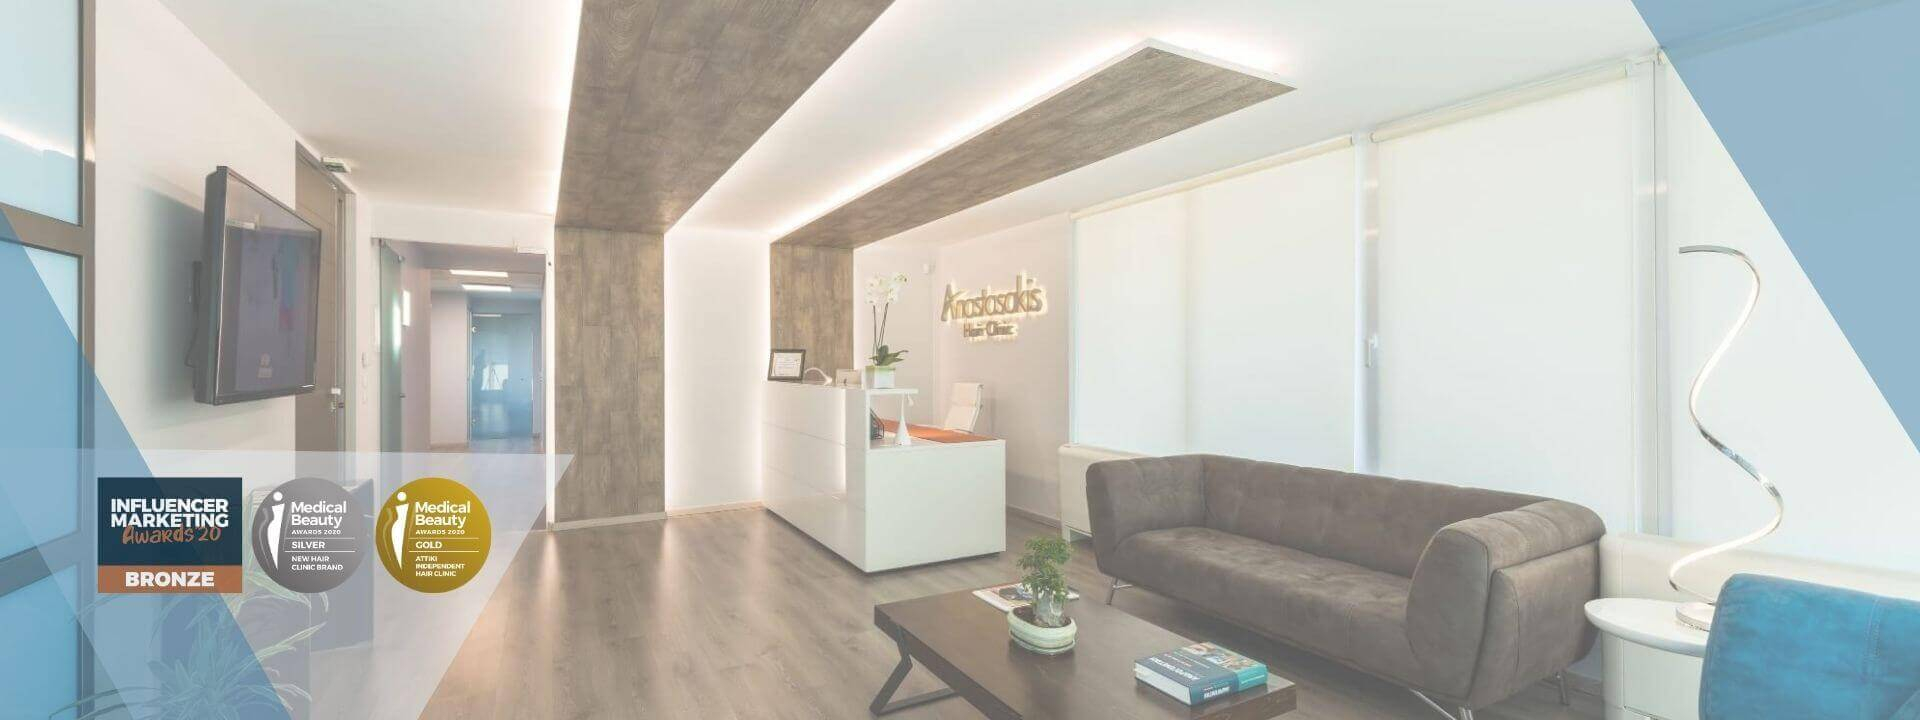 Anastasakis-Hair-Clinic-Awards